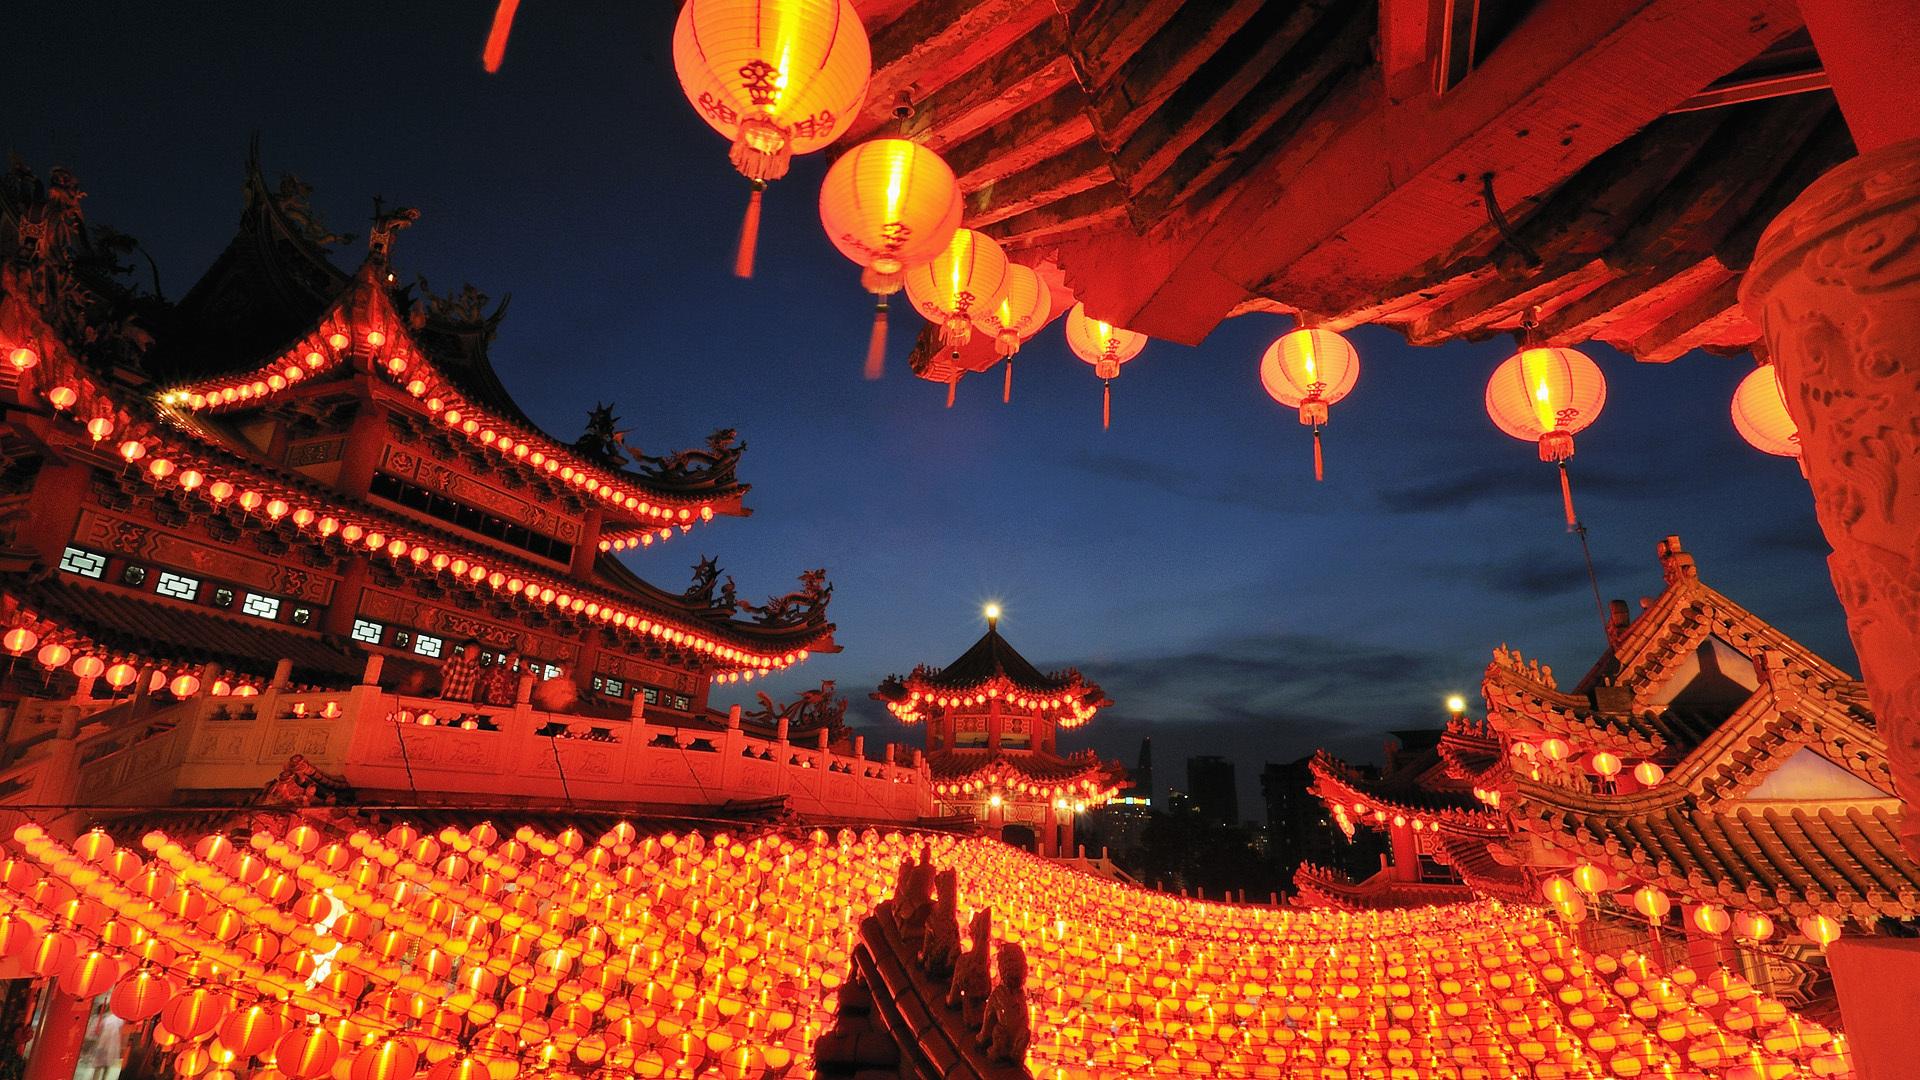 Cool Wallpaper Night Lantern - World___China__040541_  Gallery-312149.jpg